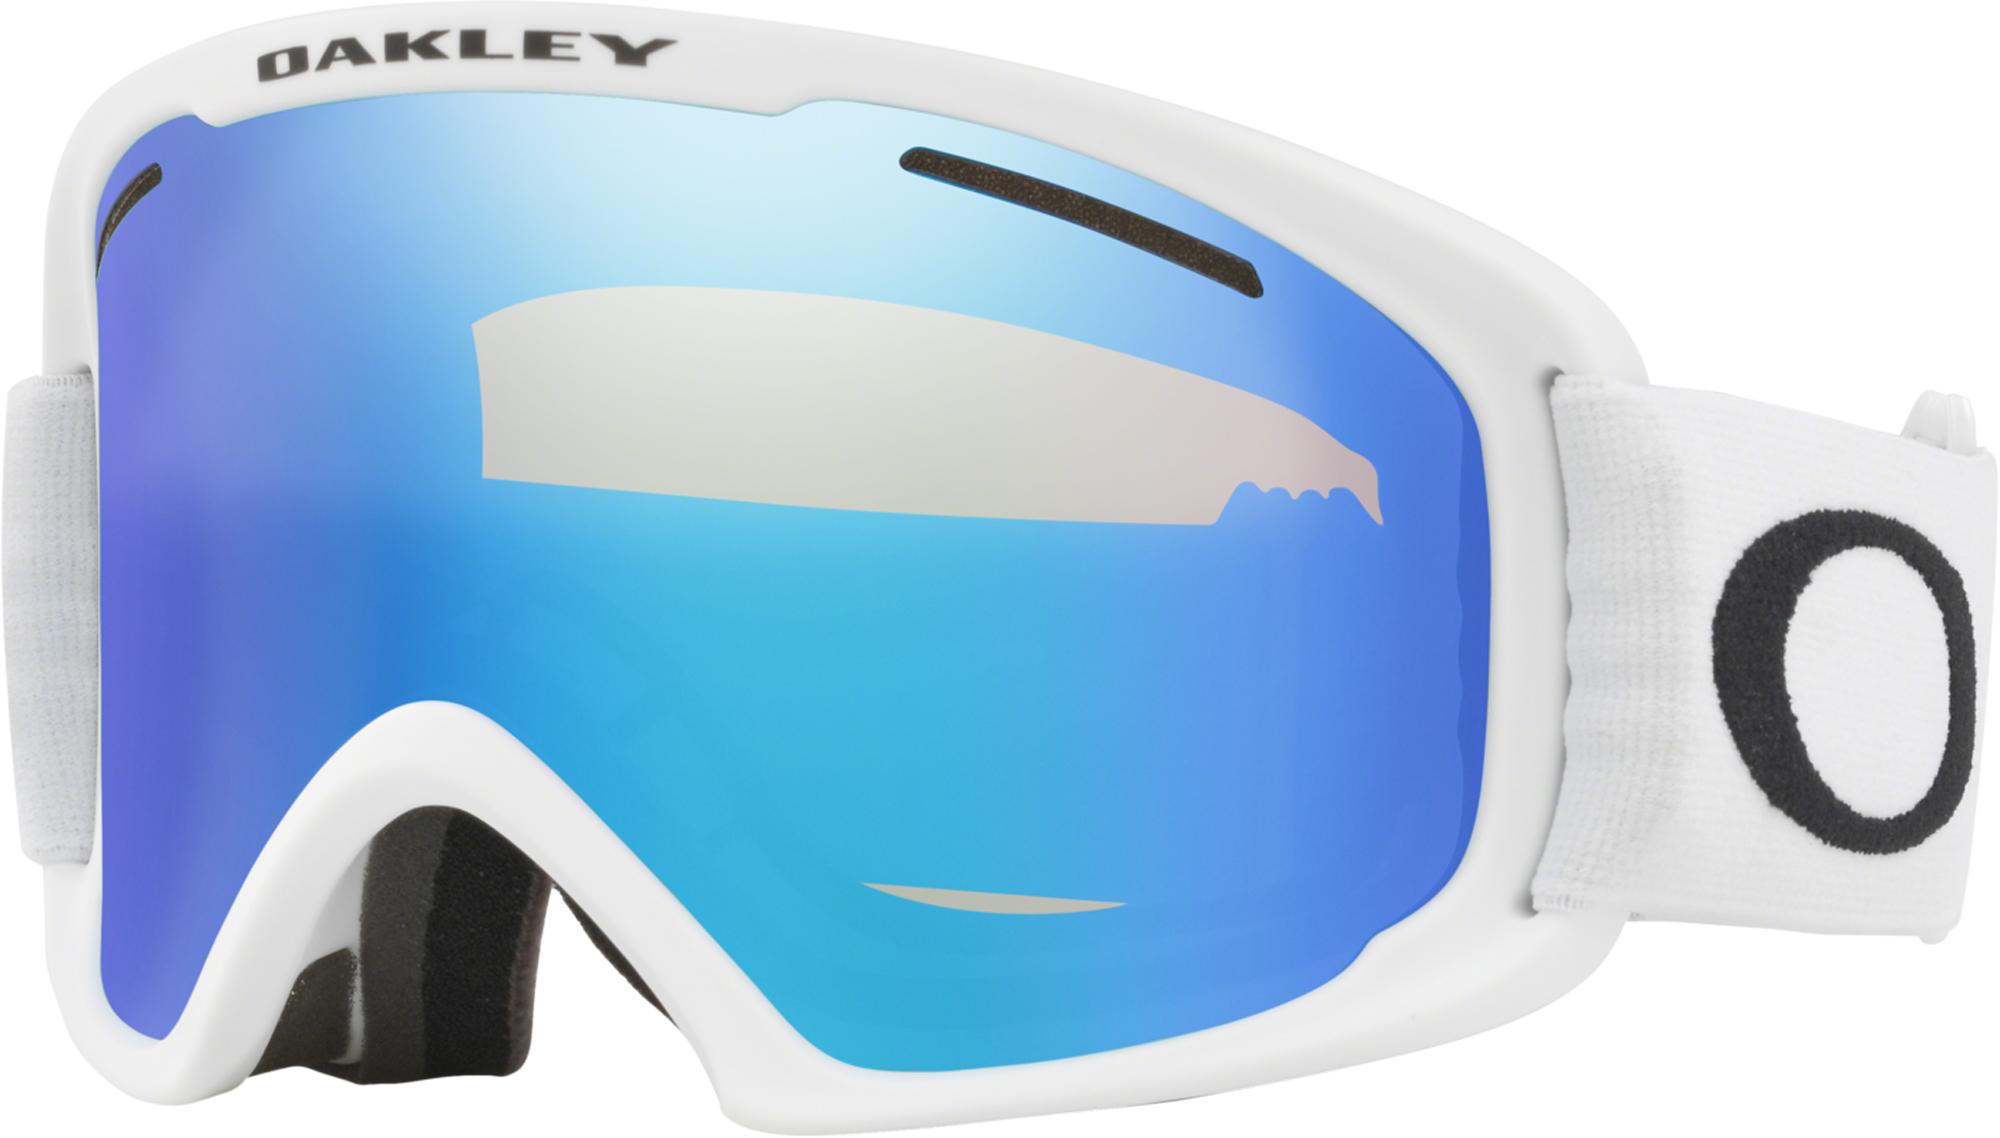 Oakley Маска со сменной линзой Oakley O Frame 2.0 XL цена